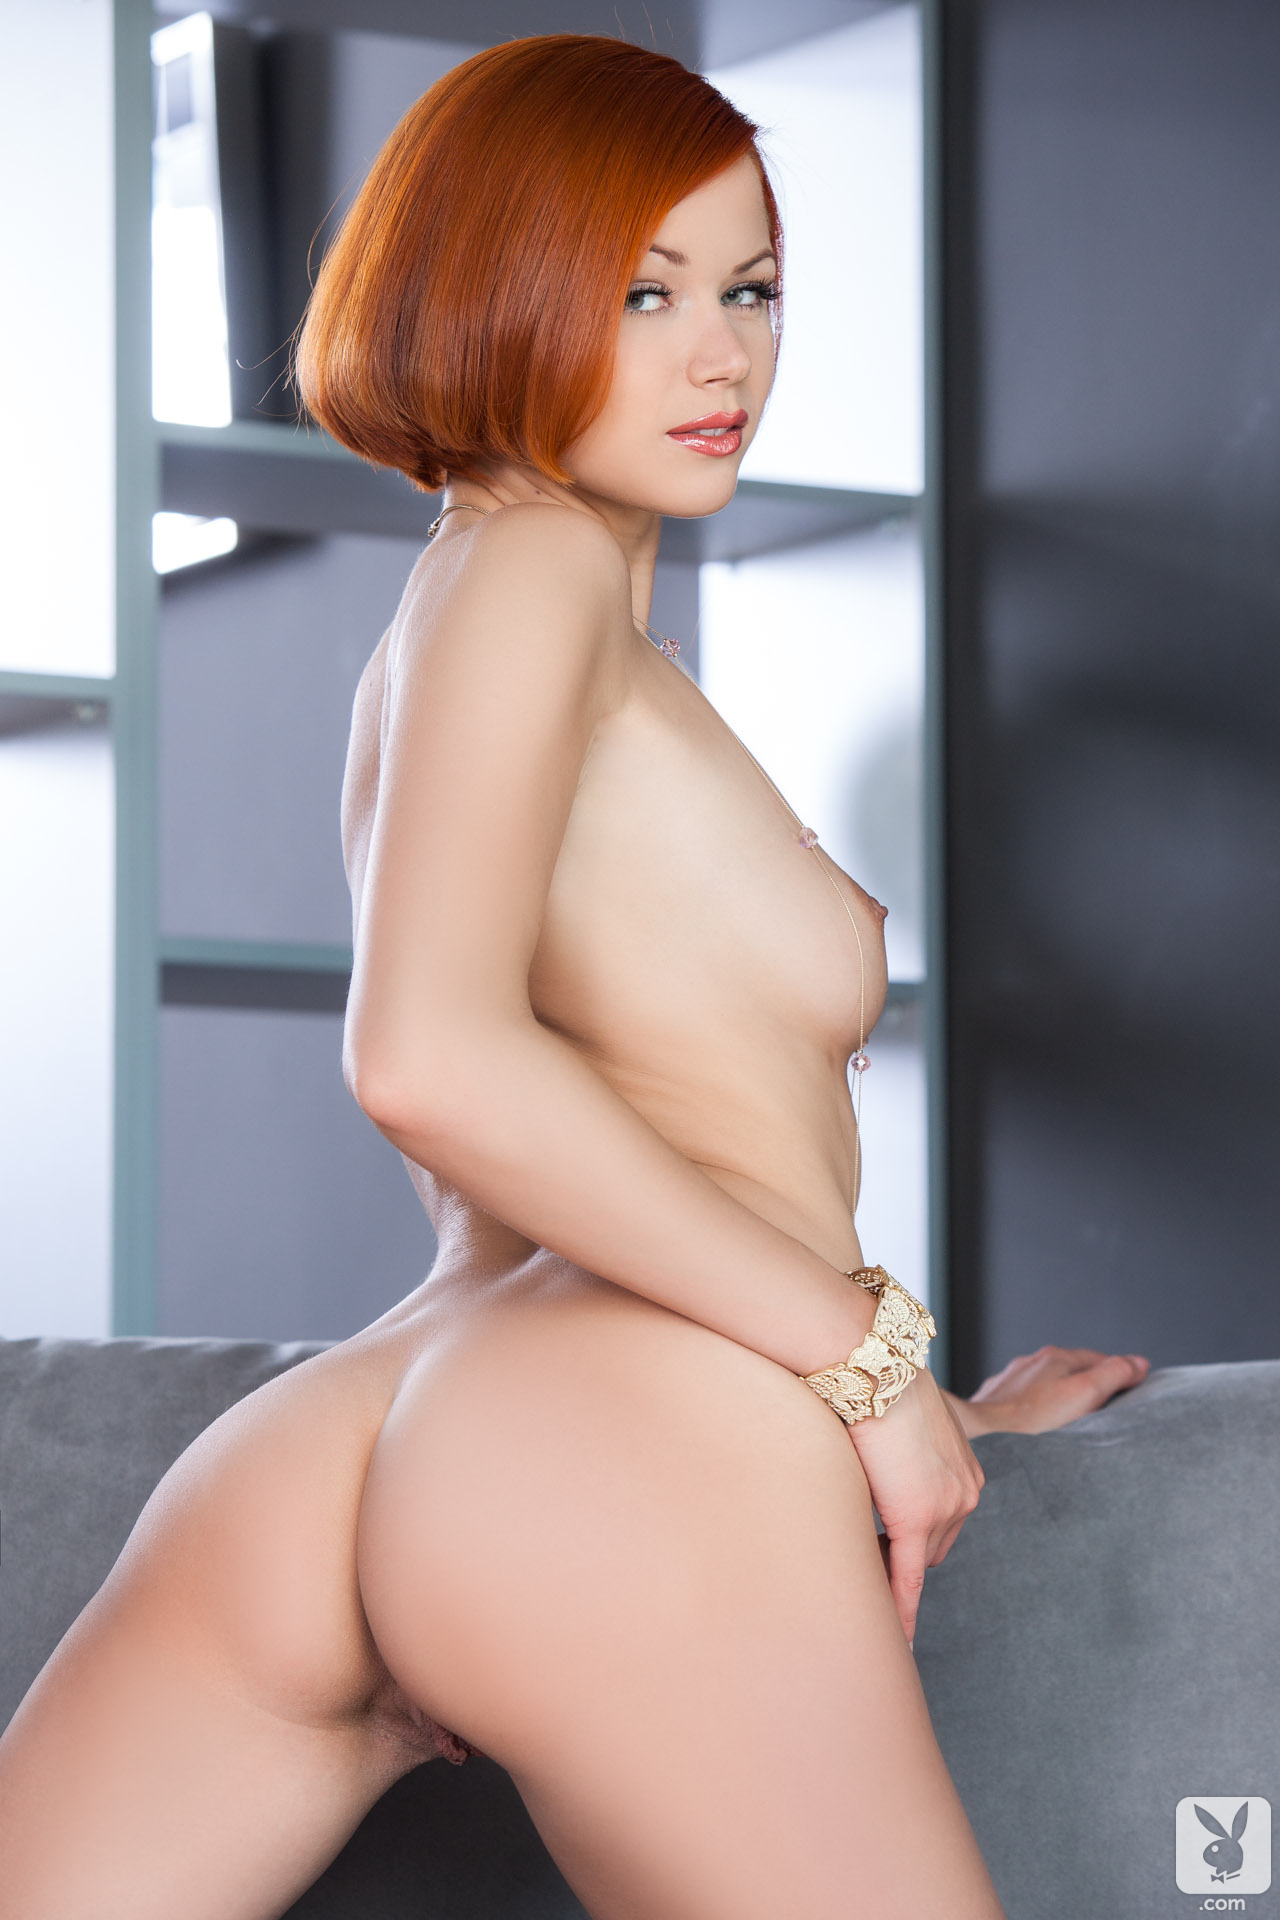 kamila-hermanova-redhead-naked-white-lingerie-playboy-29